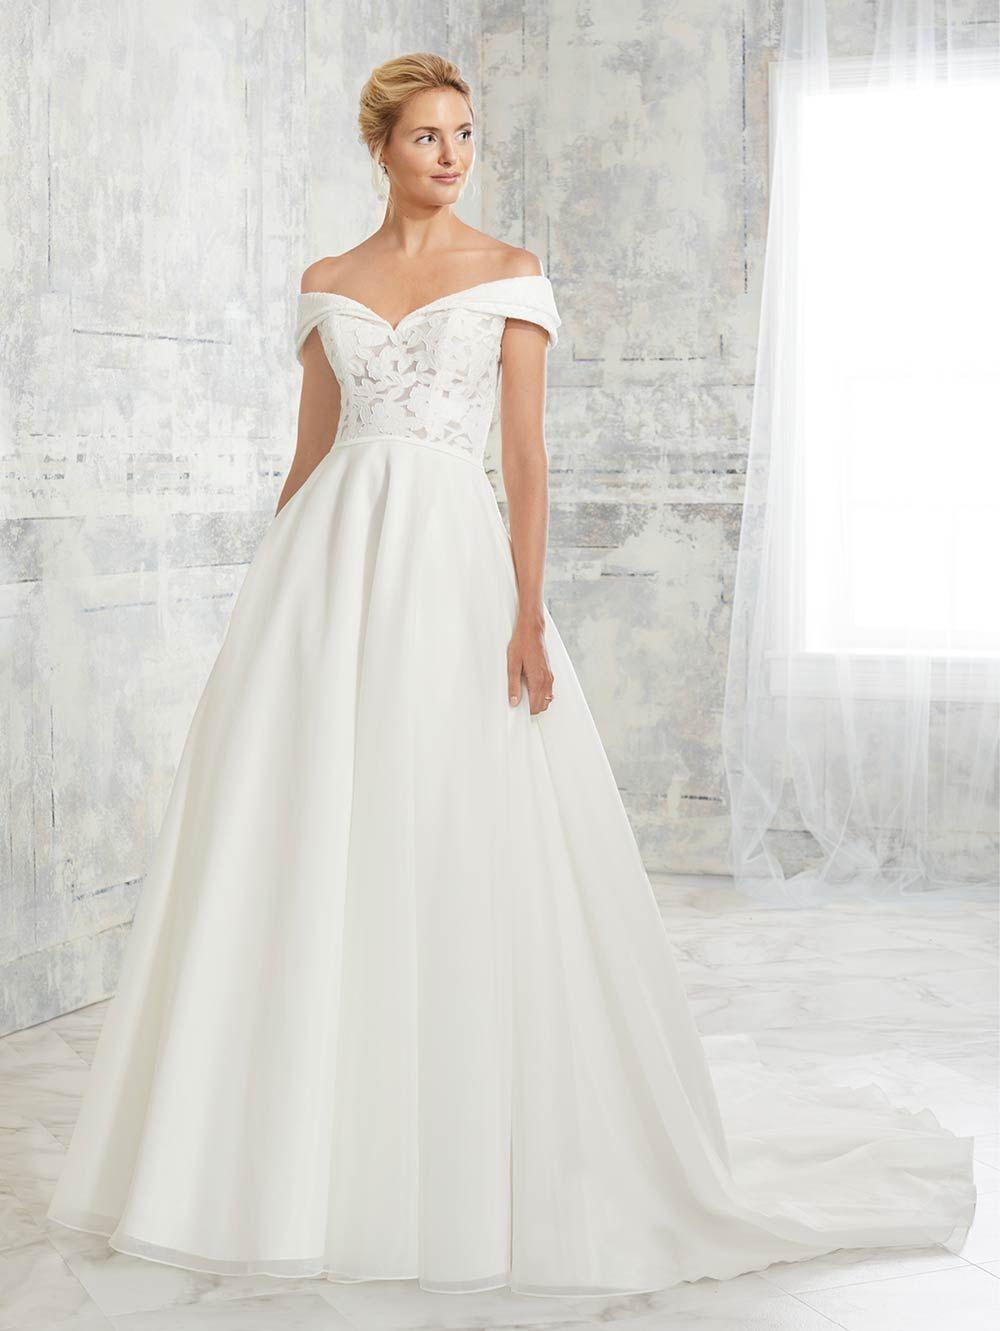 20++ Wedding dress with portrait collar information